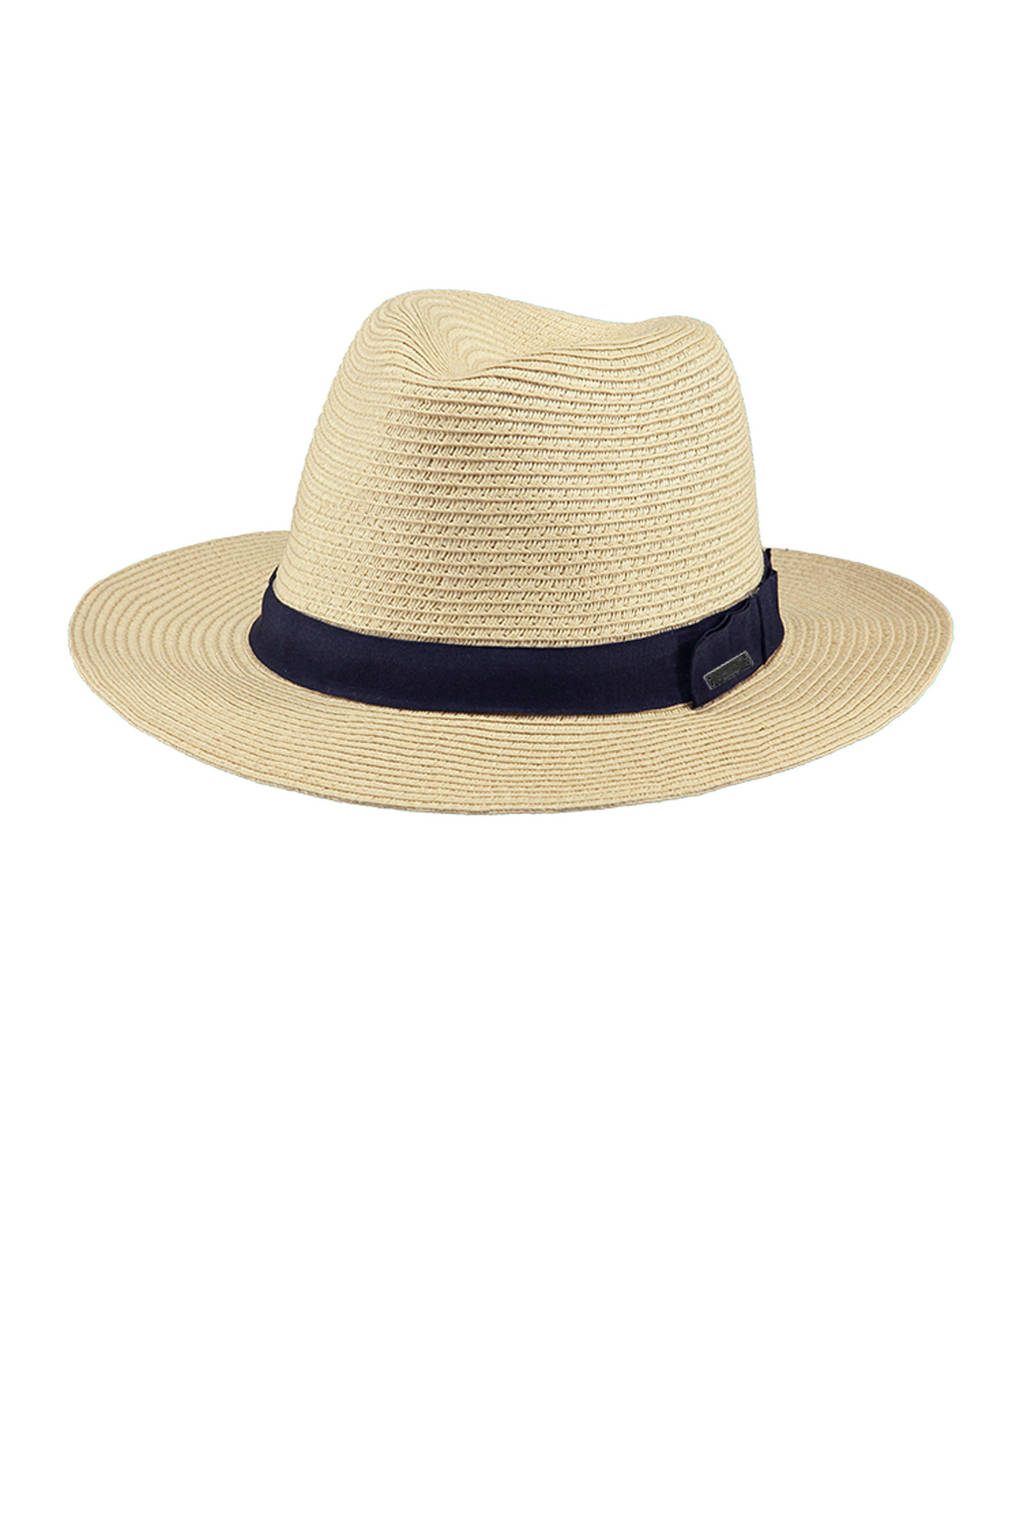 Barts Aveloz Hat, Ecru